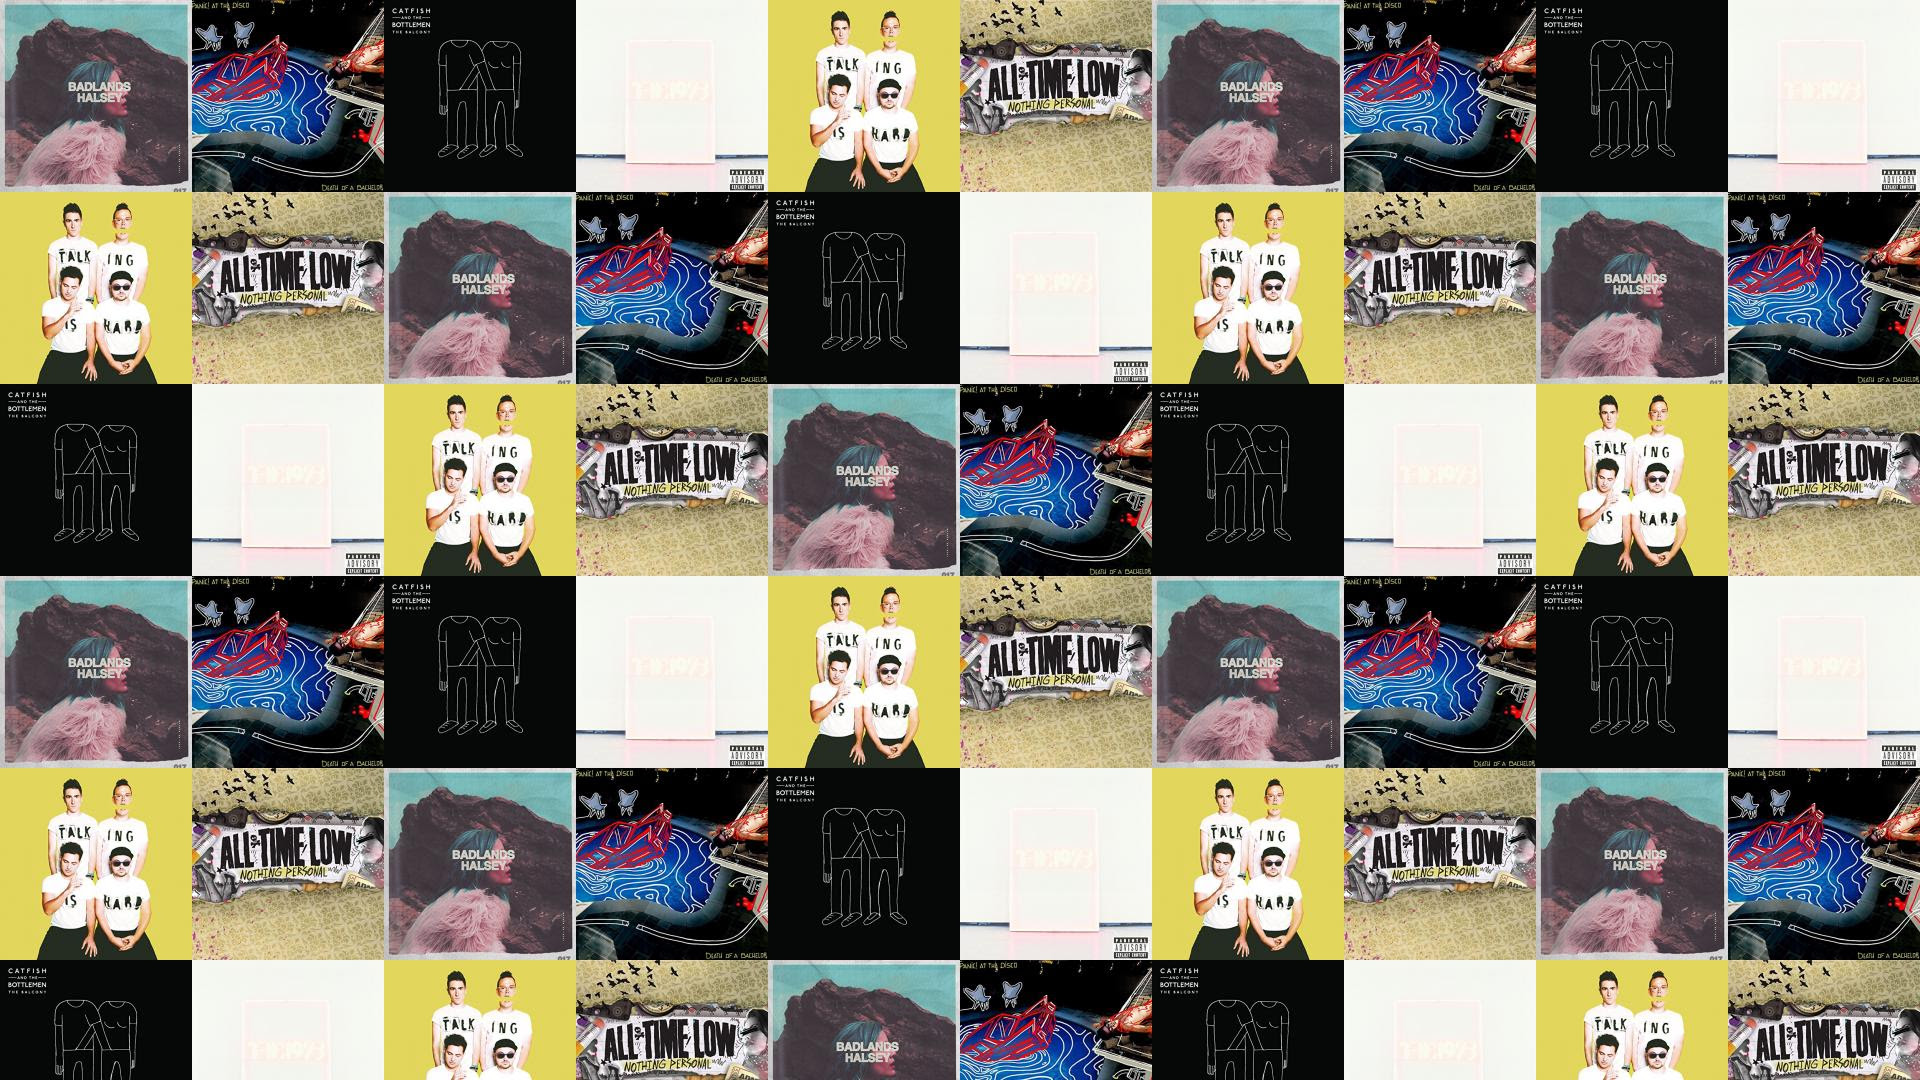 Halsey Badlands Panic At Disco Death Bachelor Catfish Wallpaper